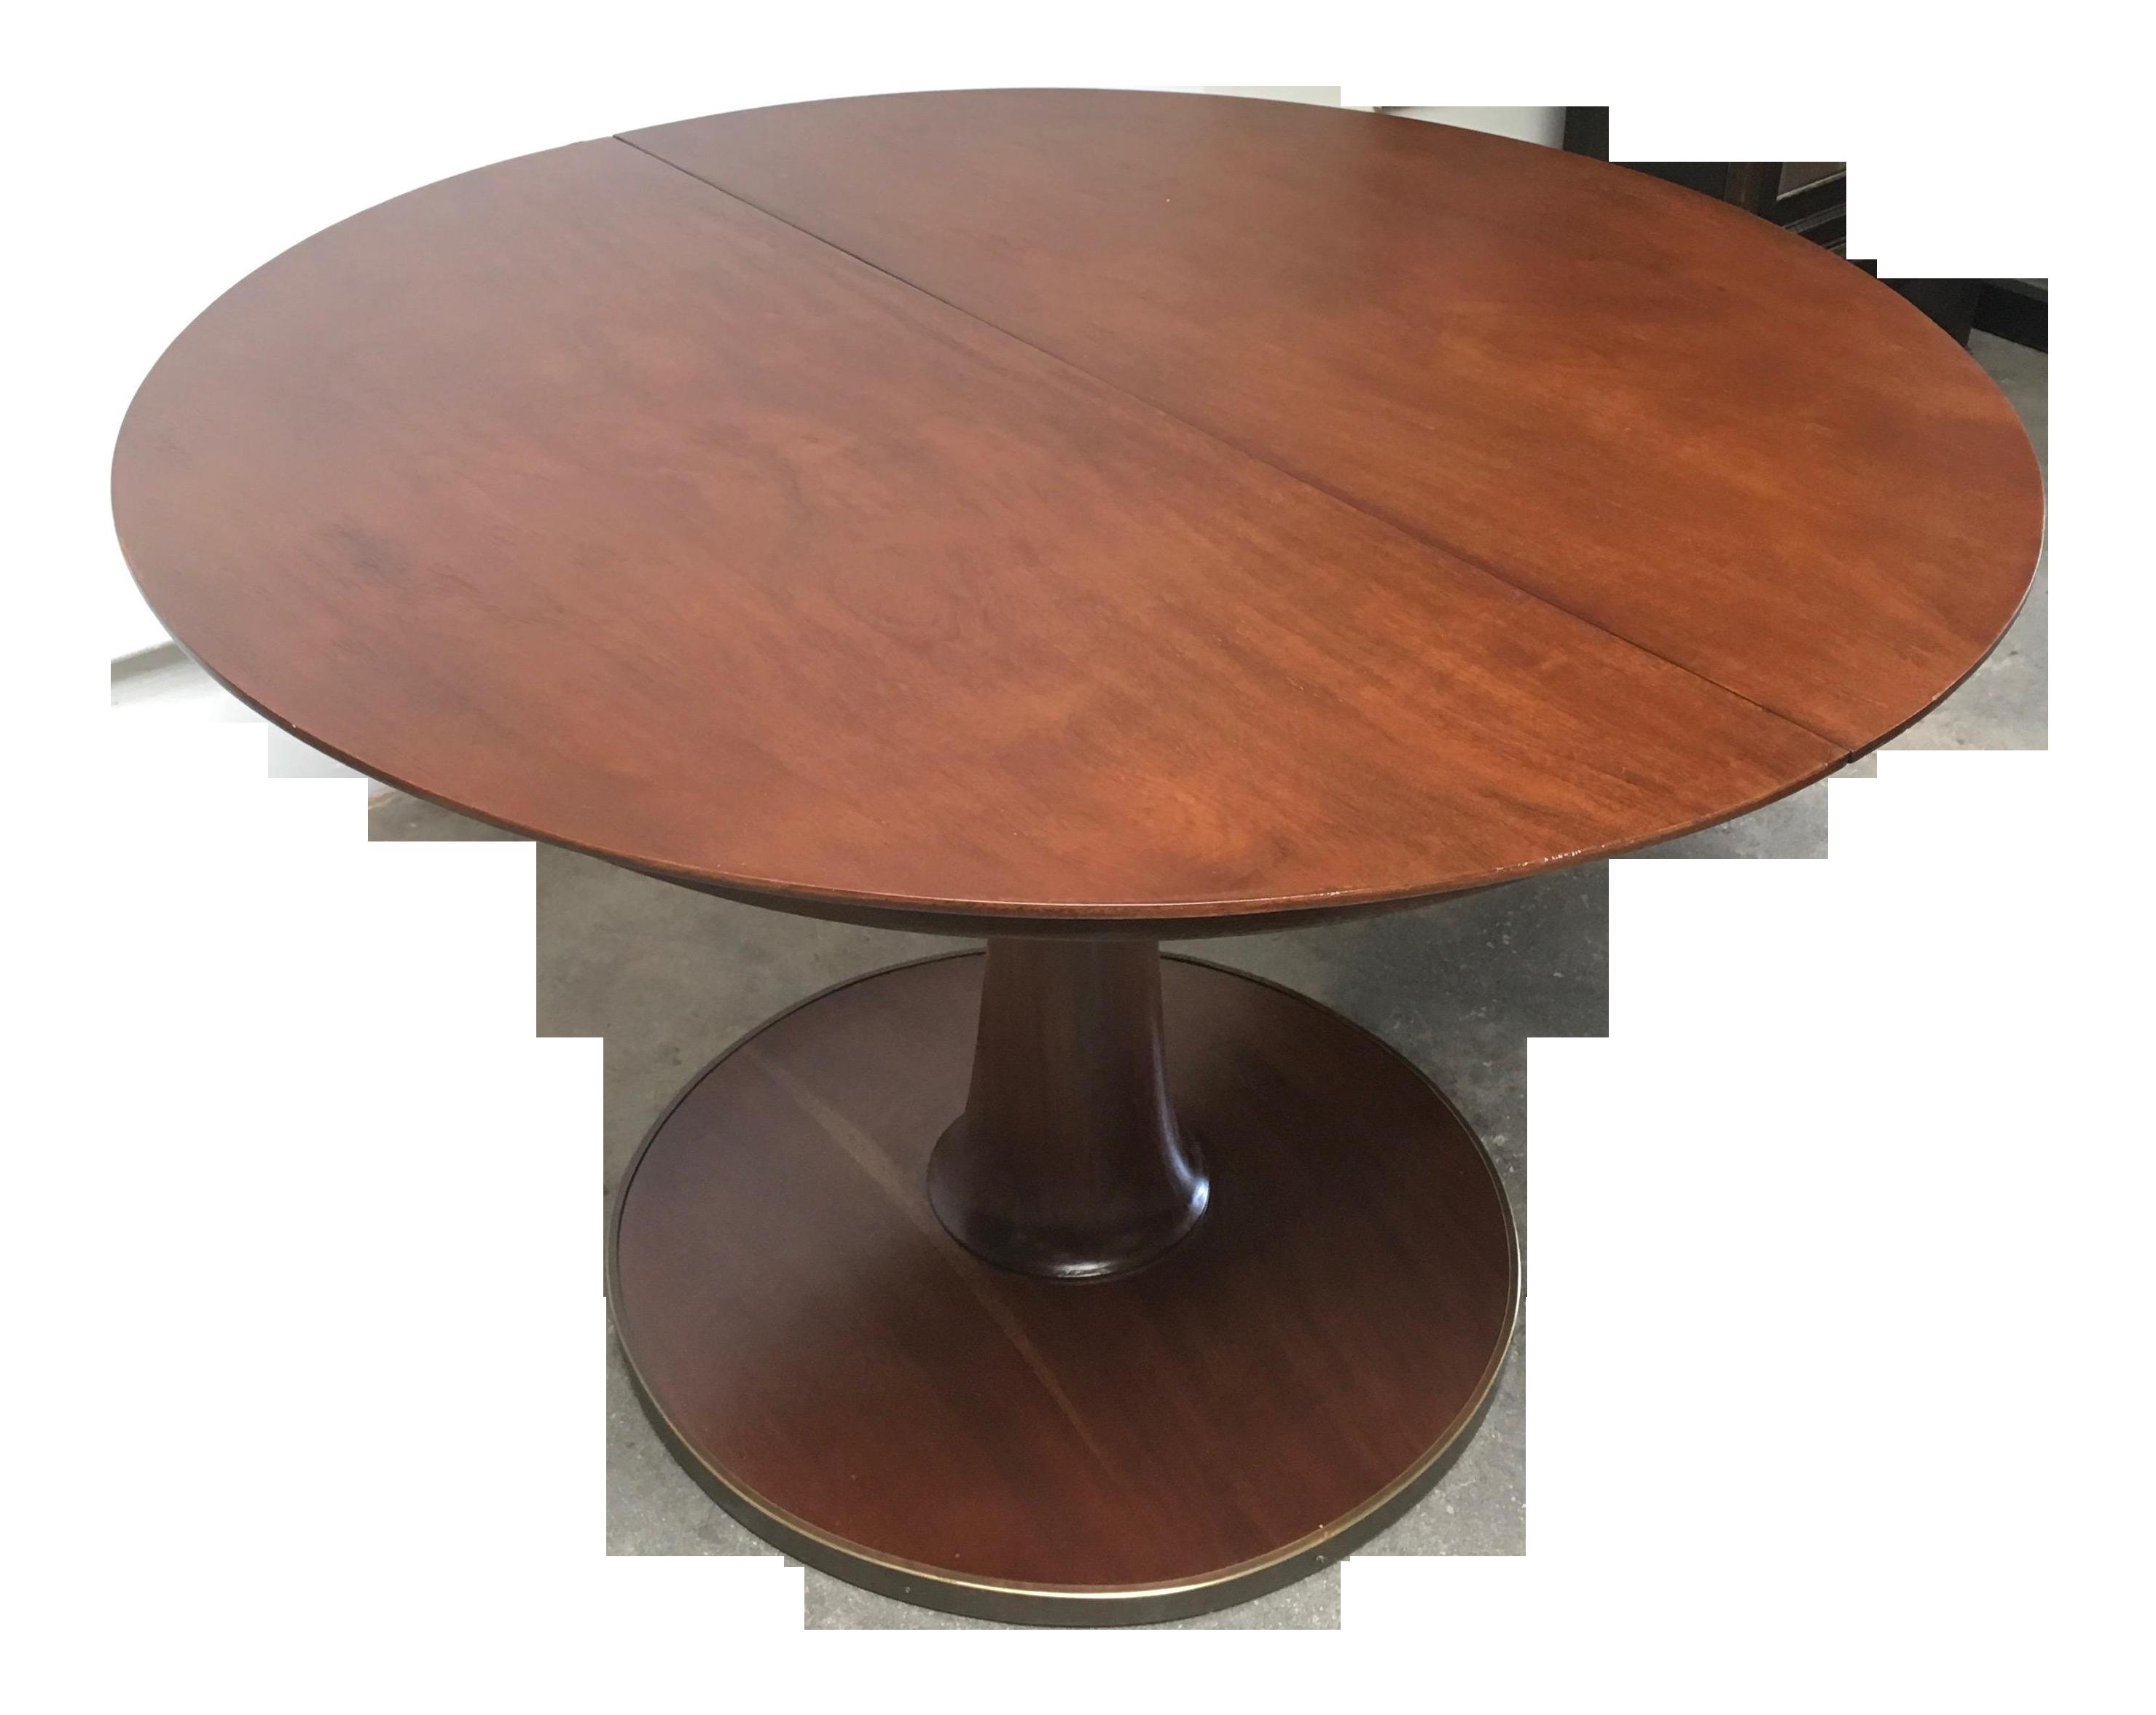 T H Robsjohn Gibbings Expandable Round Mahogany Dining Table Chairish